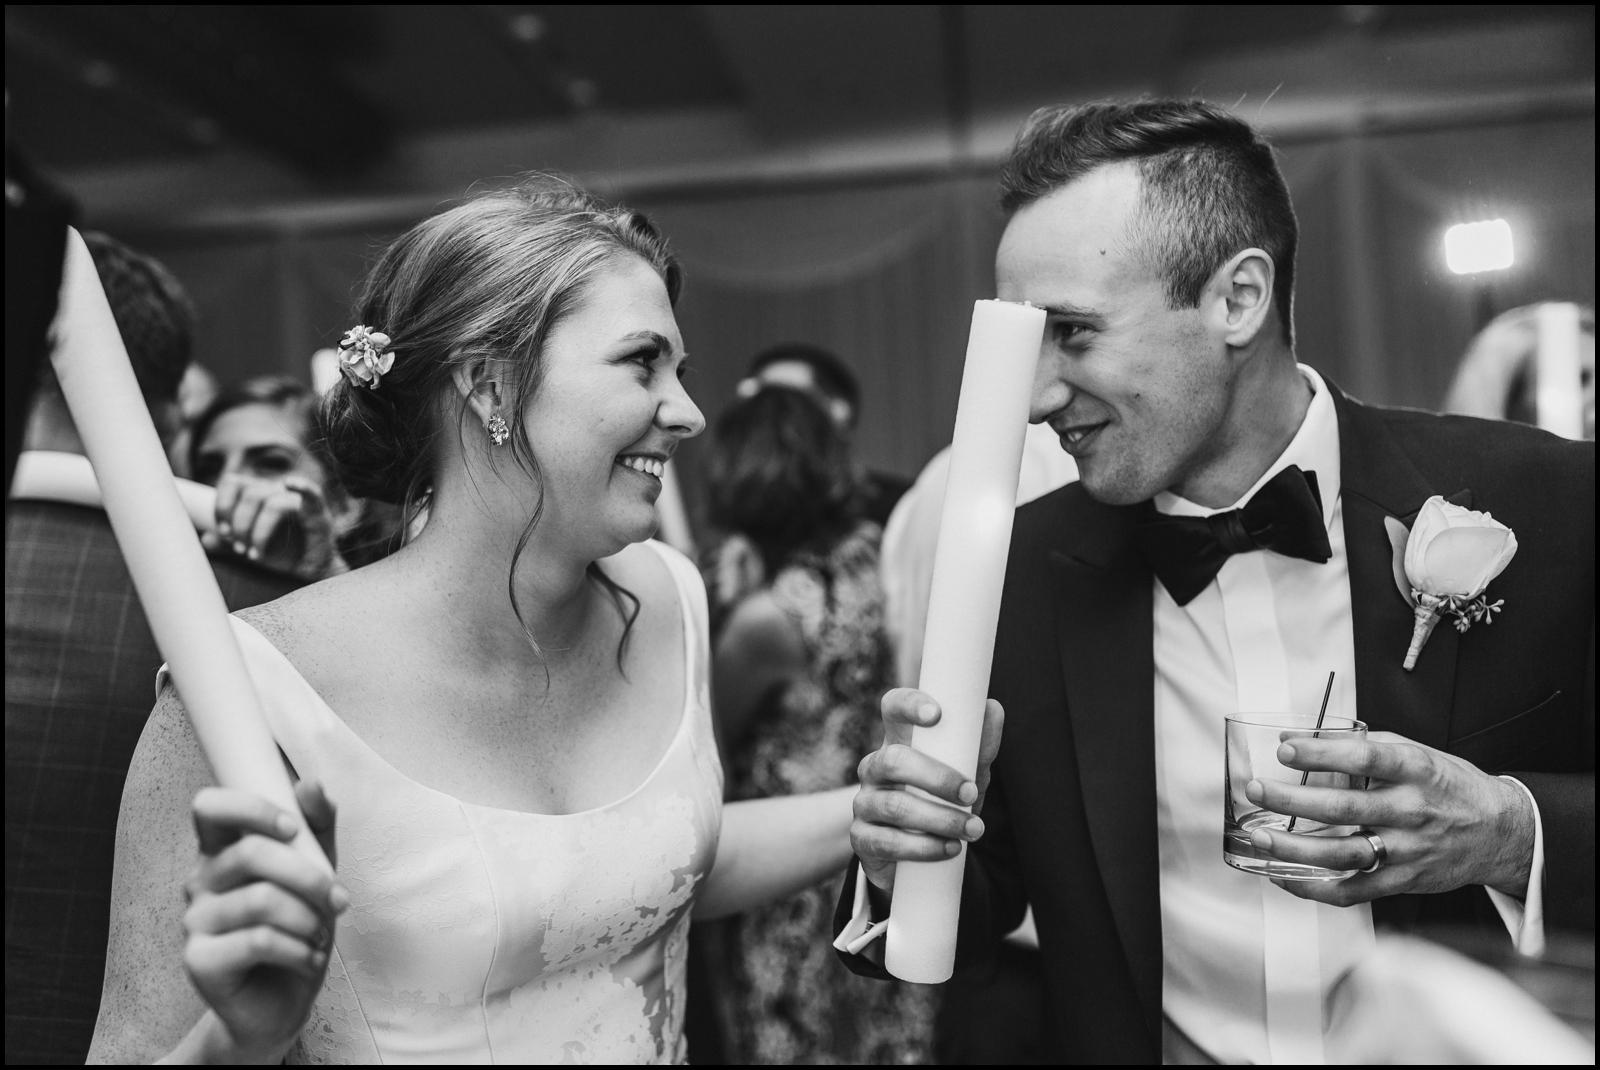 Chicago wedding at The Hotel Arista